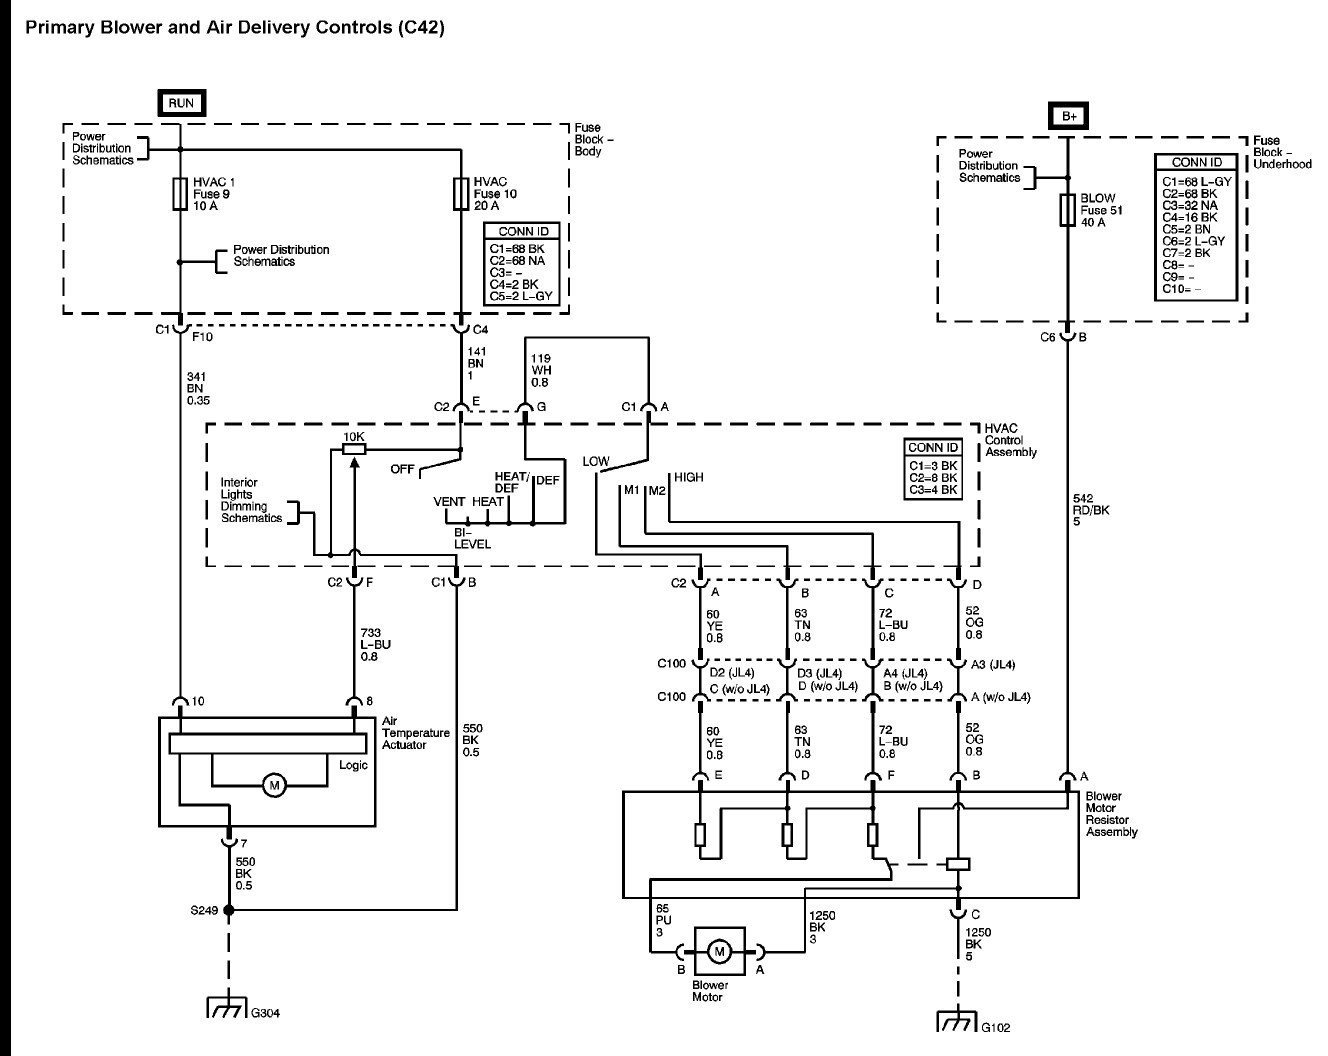 hight resolution of 2000 chevy silverado blower motor diagram diy enthusiasts wiring 2002 chevy cavalier wiring diagram schematic 2000